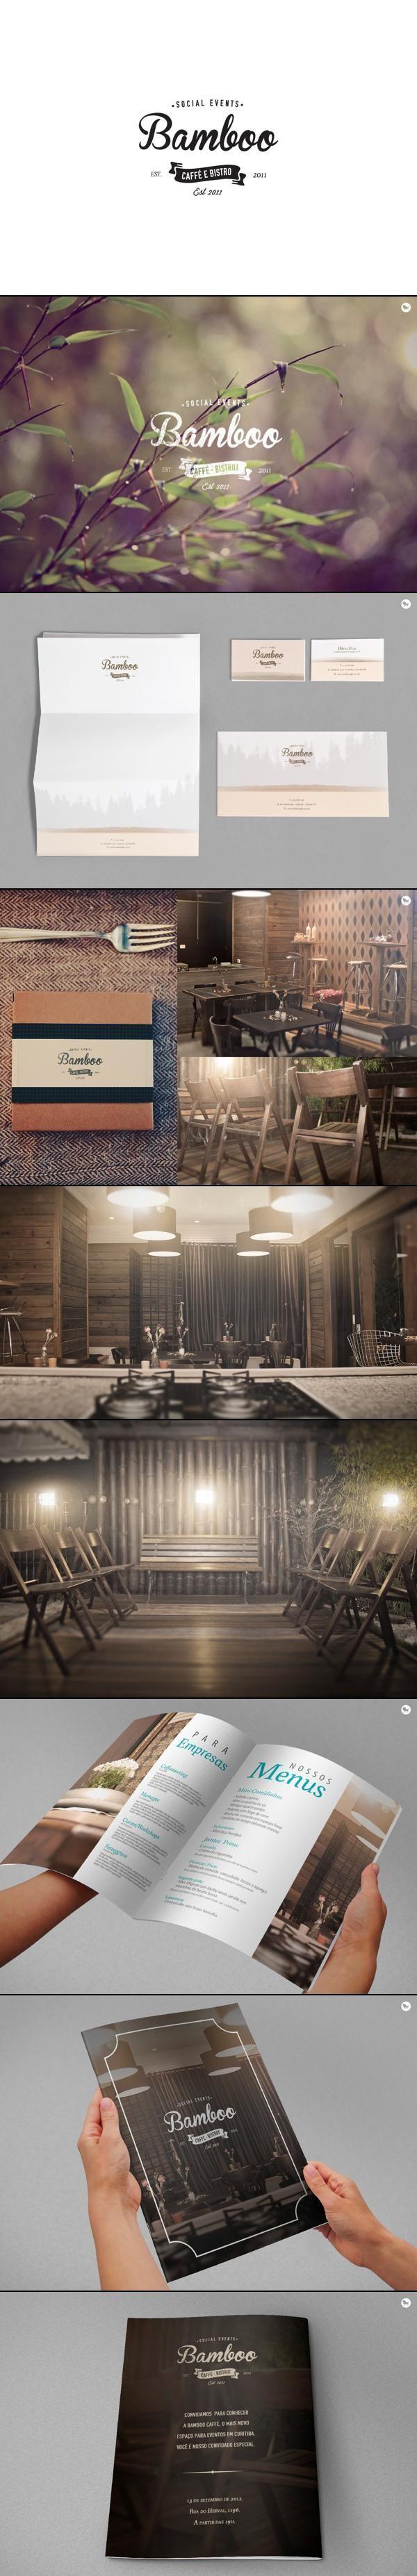 Bamboo Caffe - Social Events